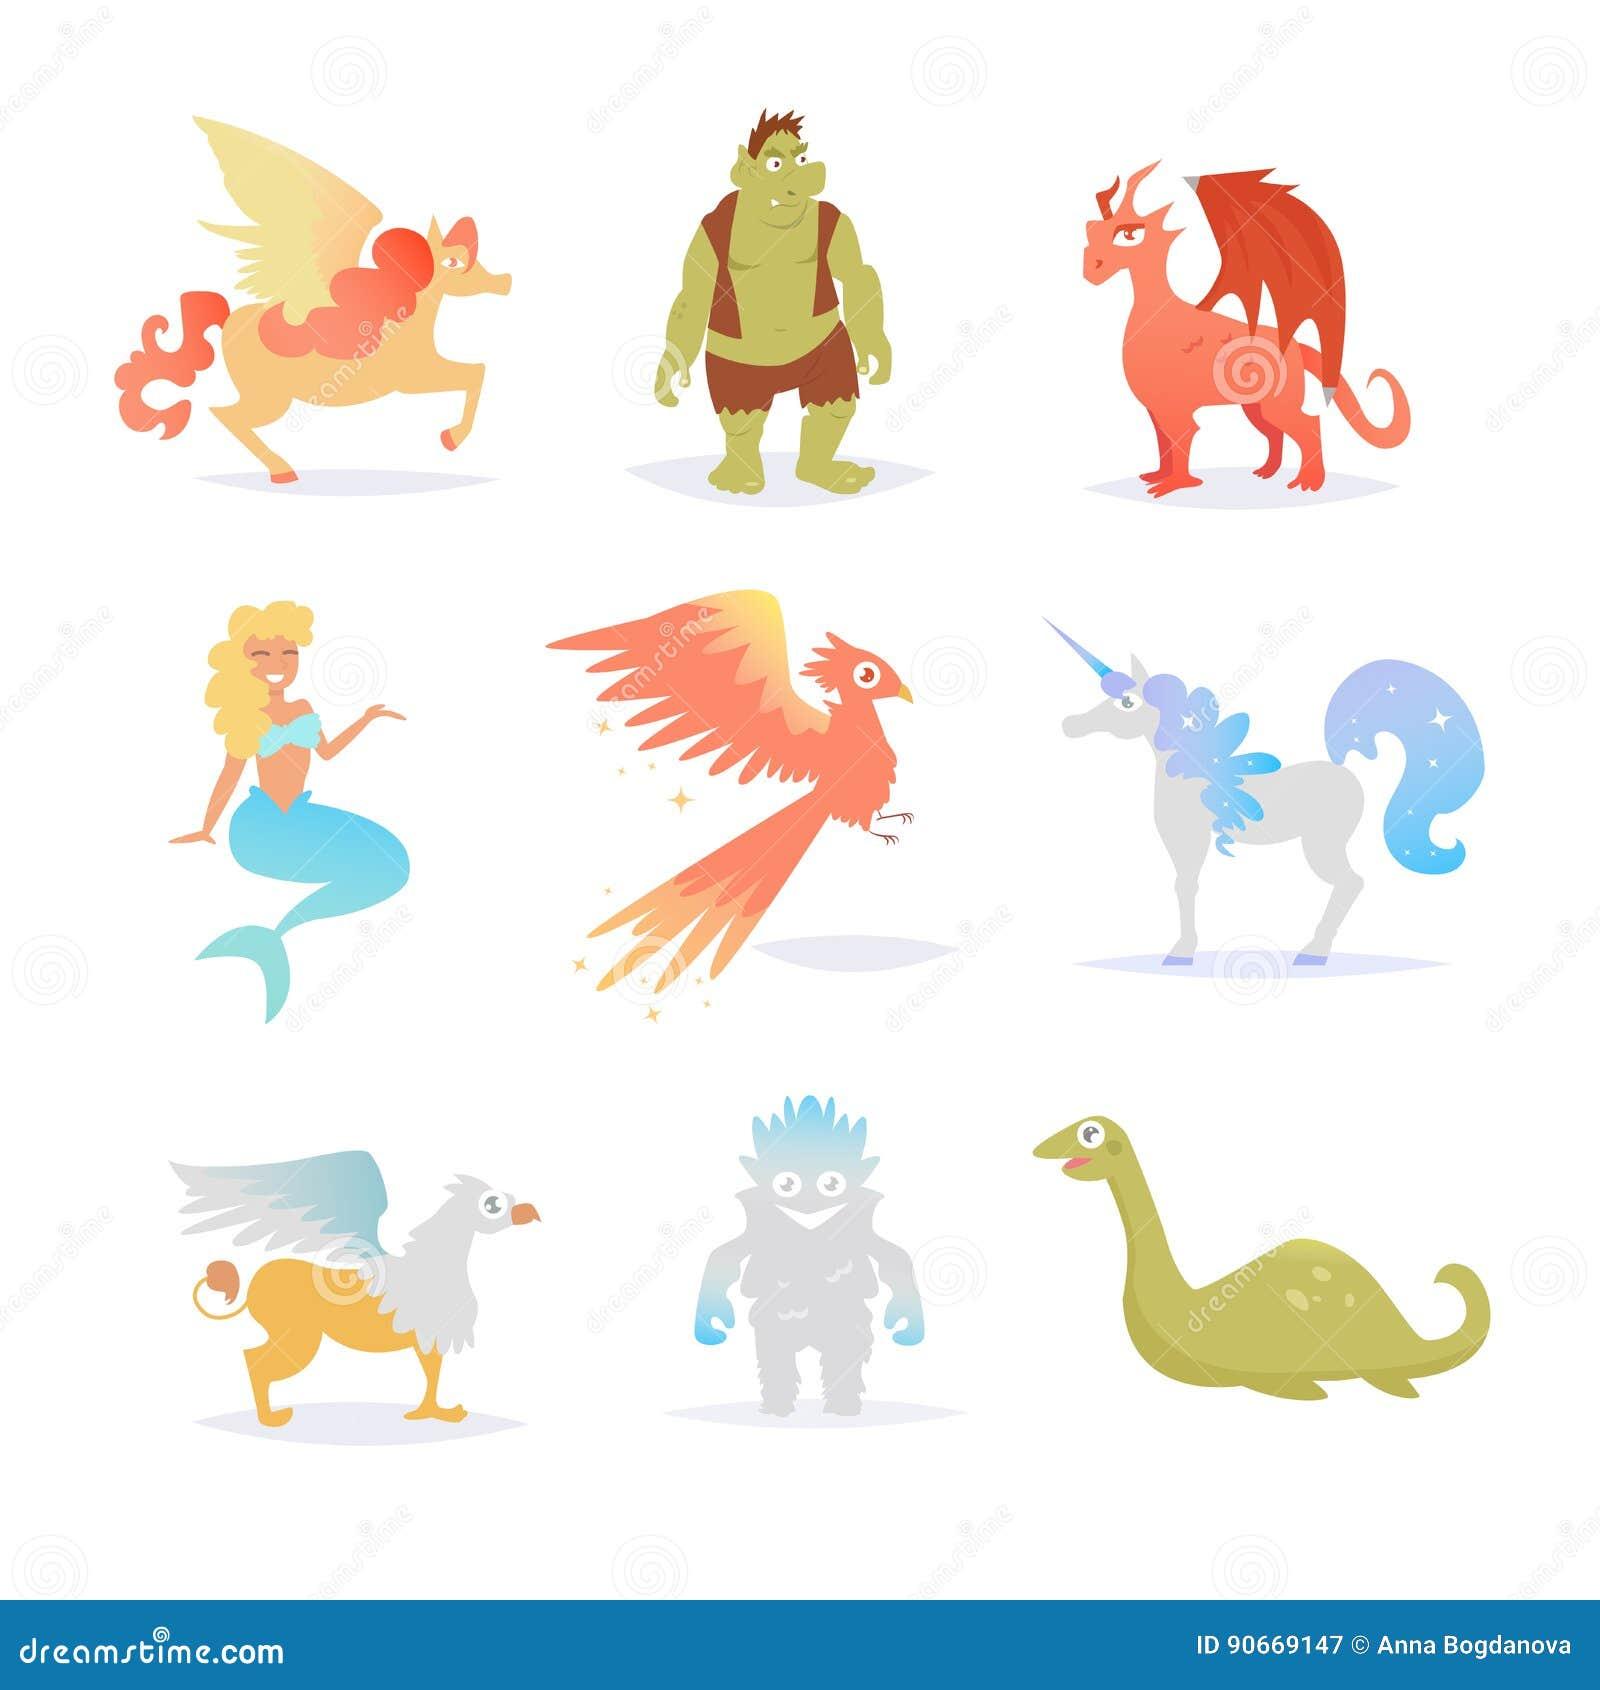 Mythological and fairy creatures.